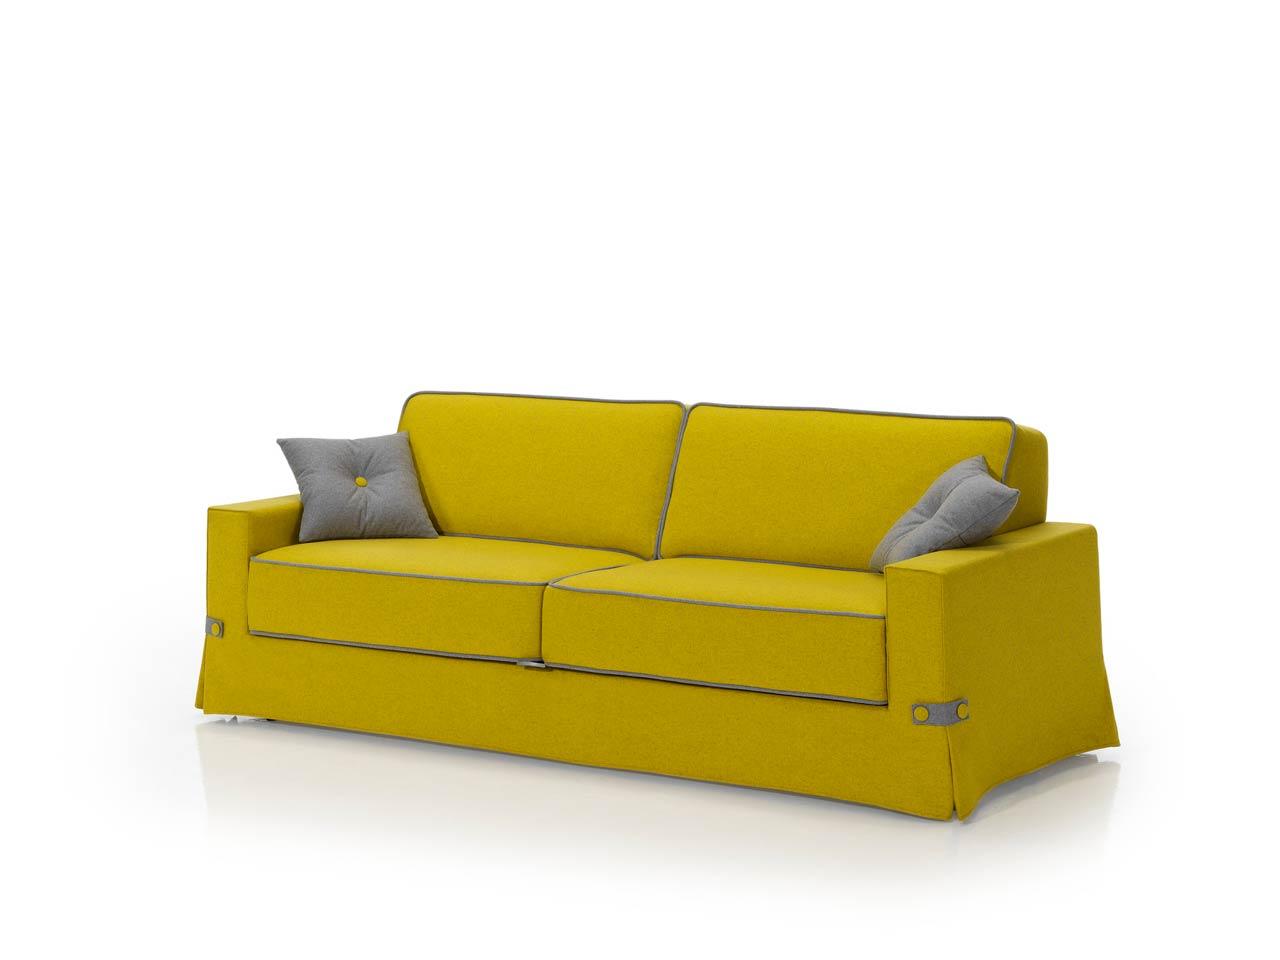 Comprar sofa cama barato online tienda online for Sofa cama puff barato